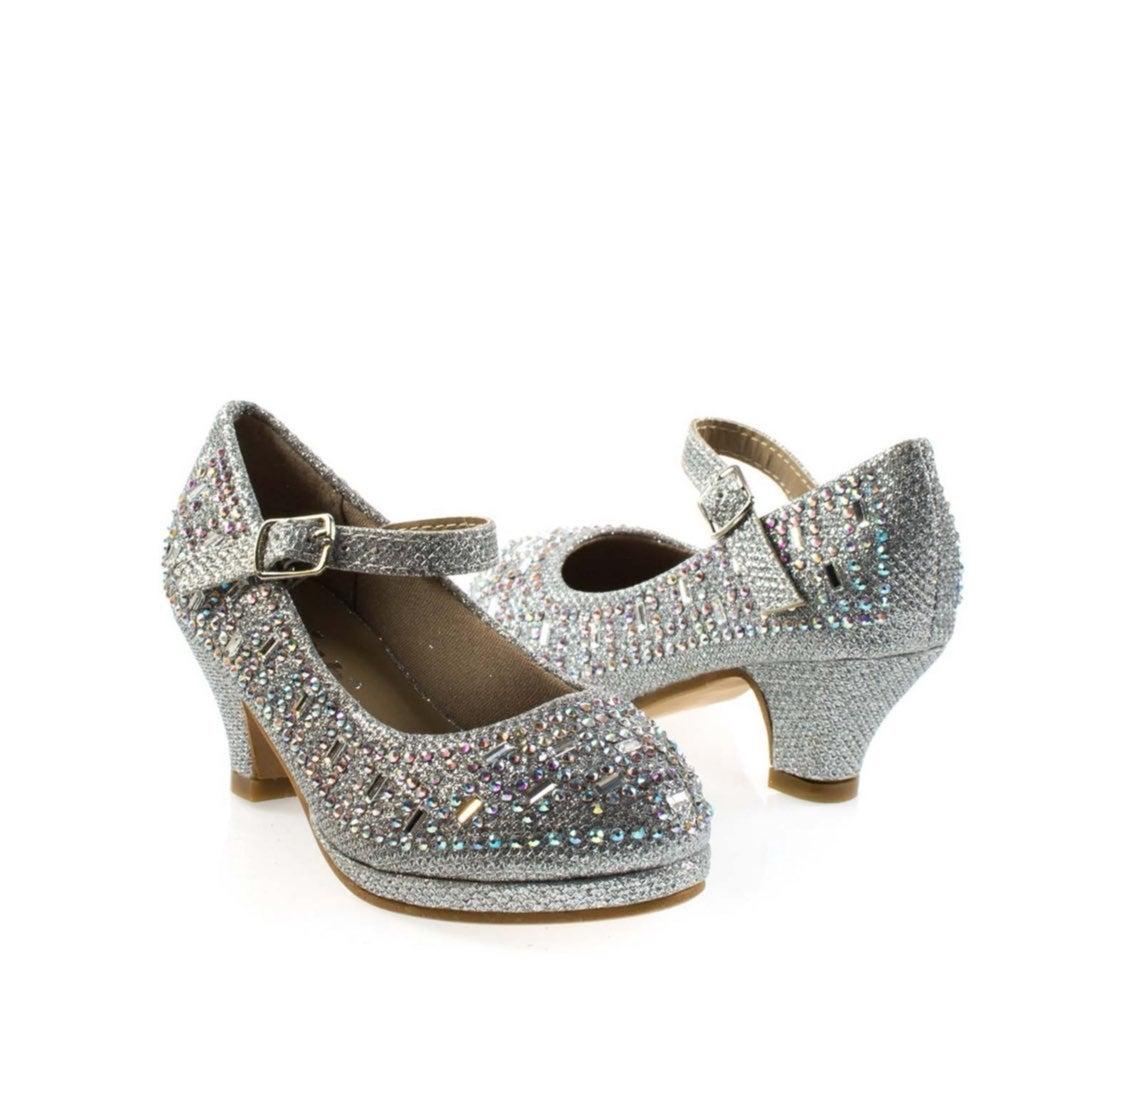 Girl's Rhinestone Dress up Formal Shoes